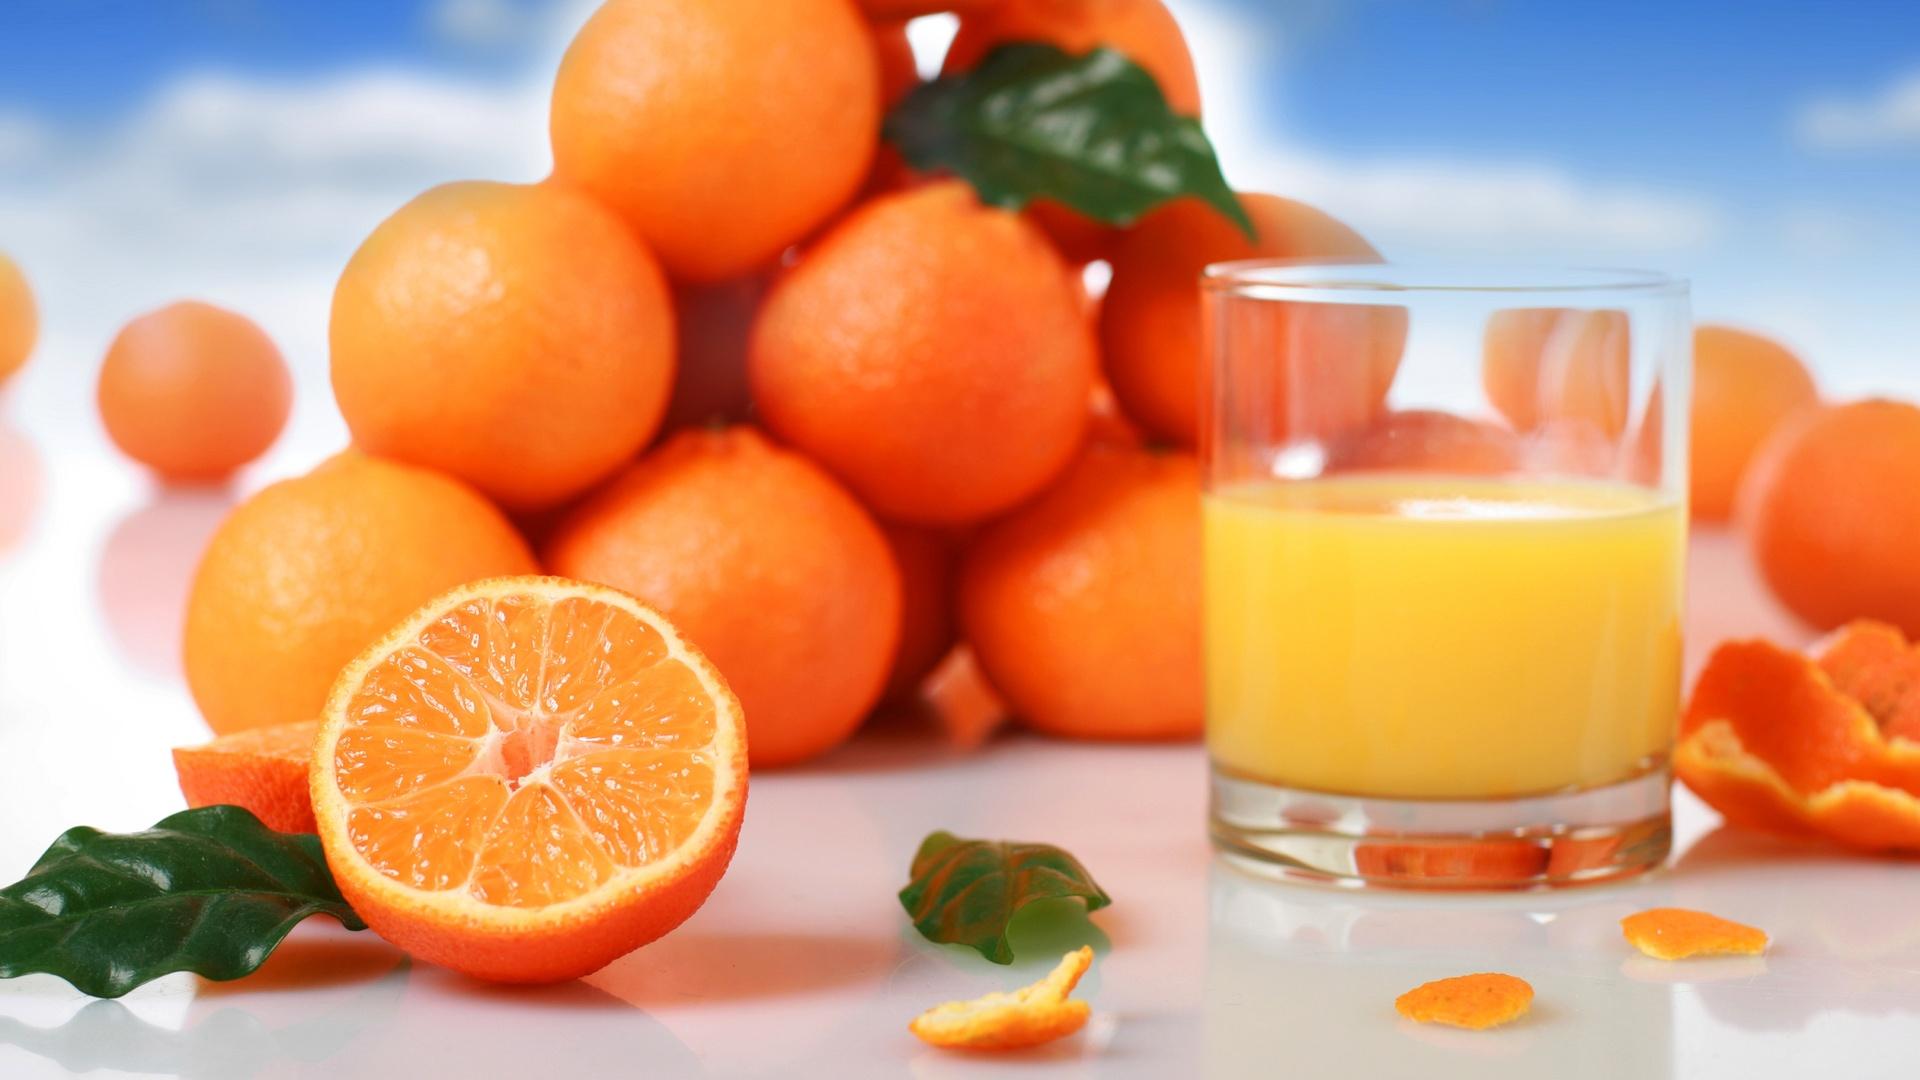 Orange Fruit Juice Wallpaper Background Wallpaper with 1920x1080 1920x1080